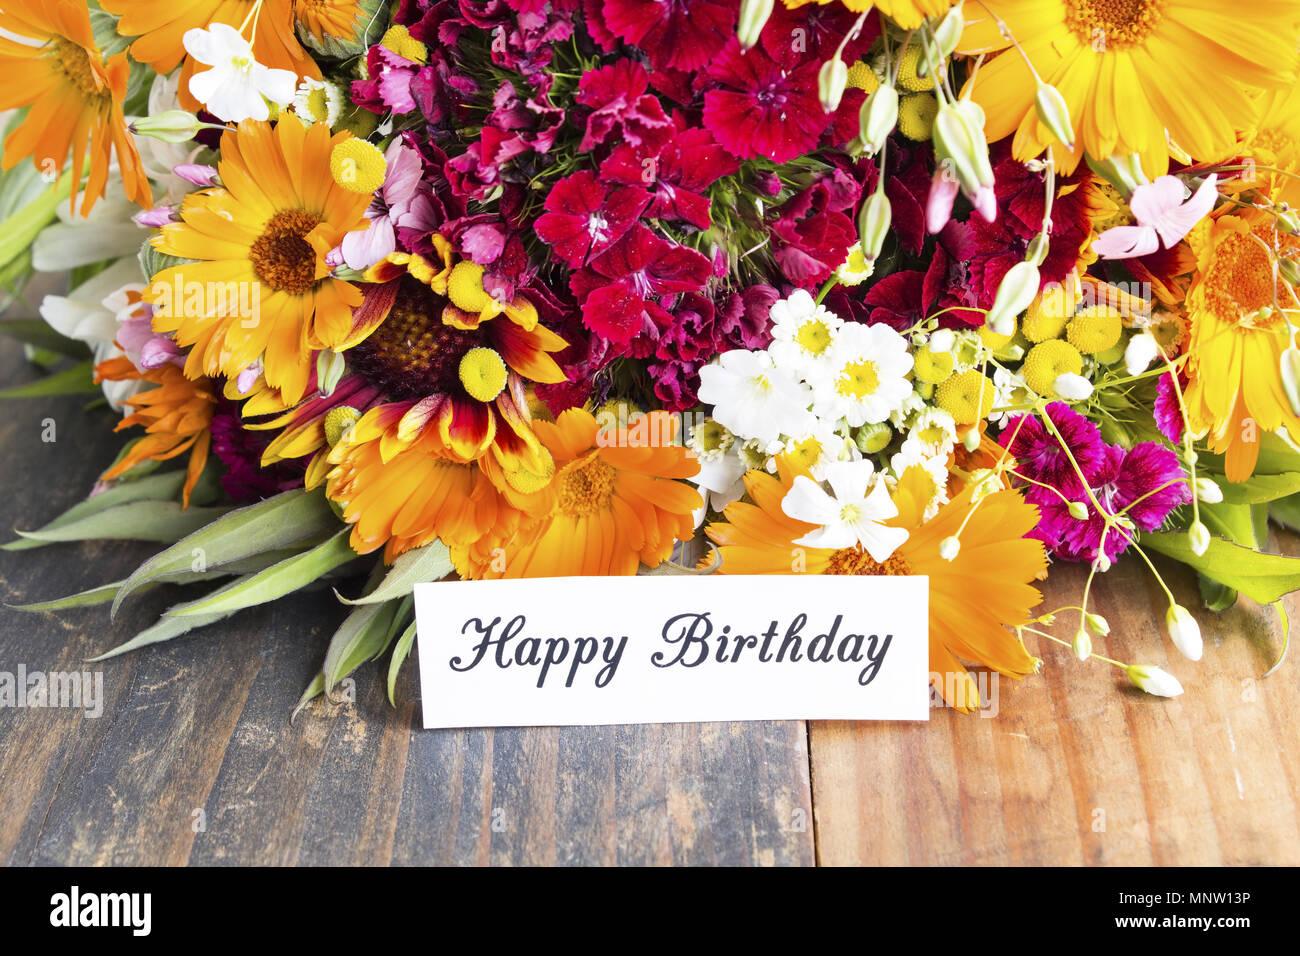 Happy Birthday Card With Spring Flowers Stock Photo 185561146 Alamy